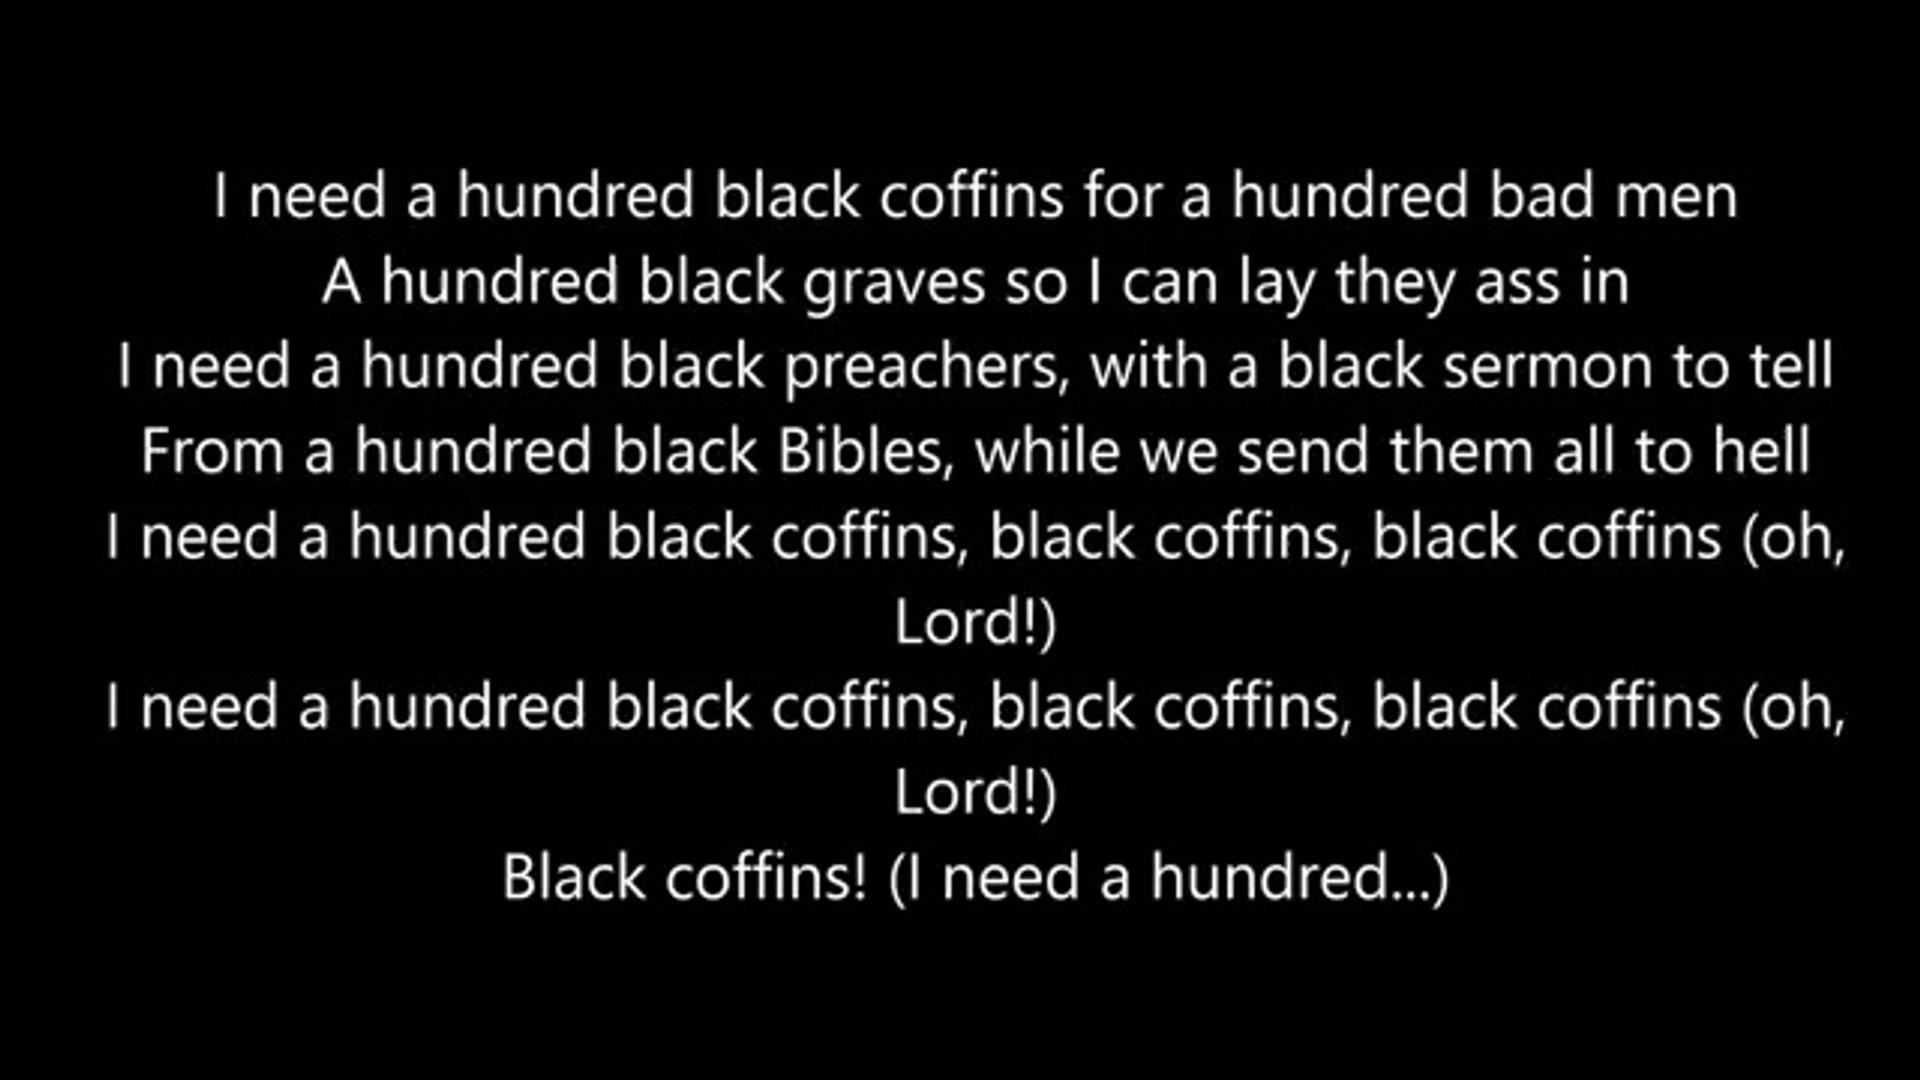 Rick Ross -100 Black Coffins - Lyrics